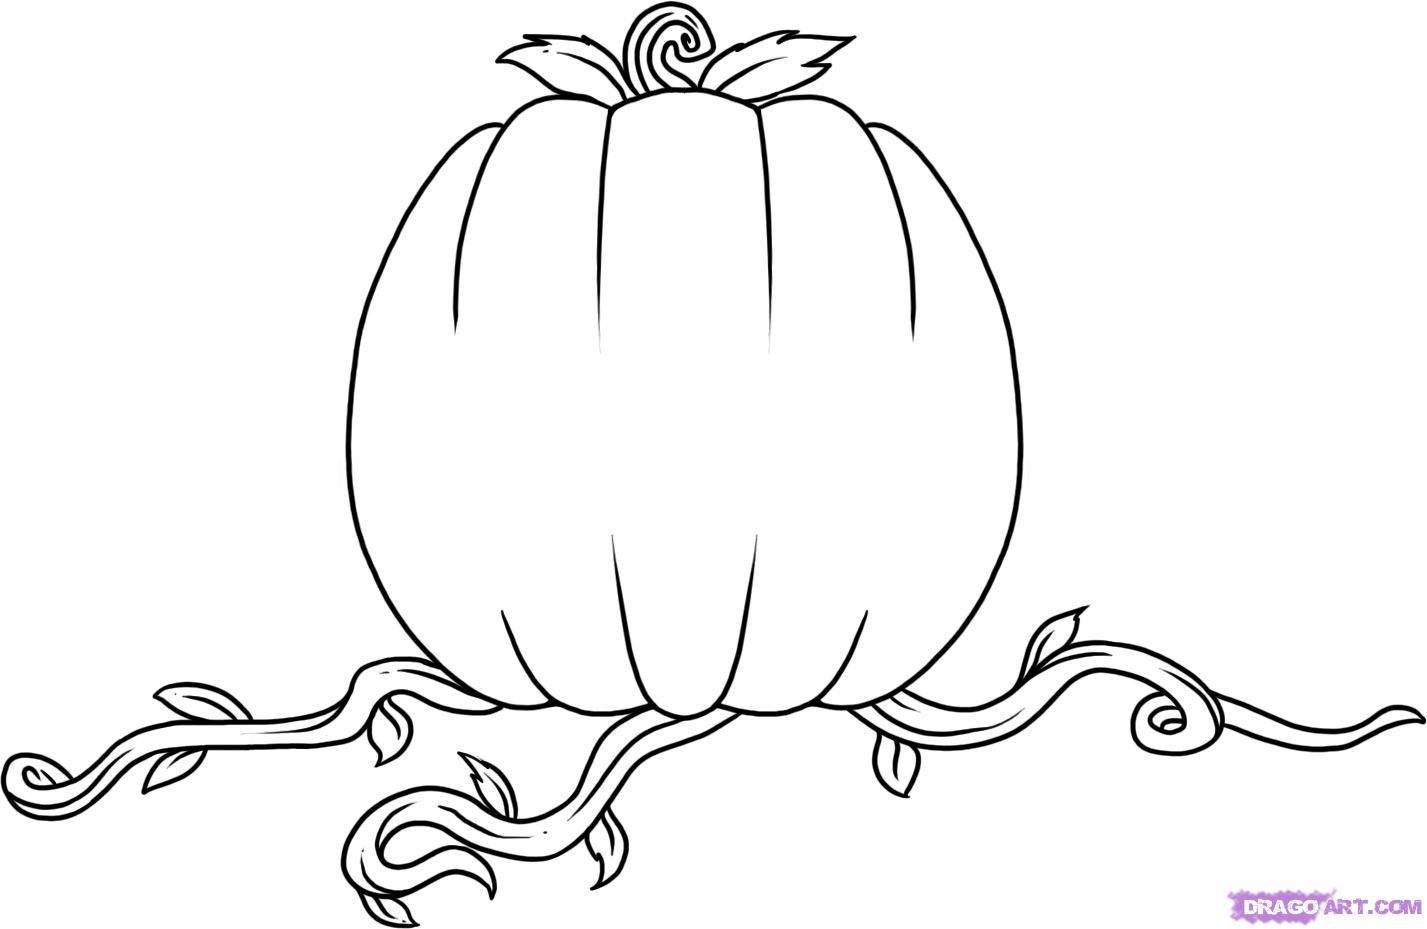 Drawn pumpkin cinderella pumpkin Pumpkin step Step to draw